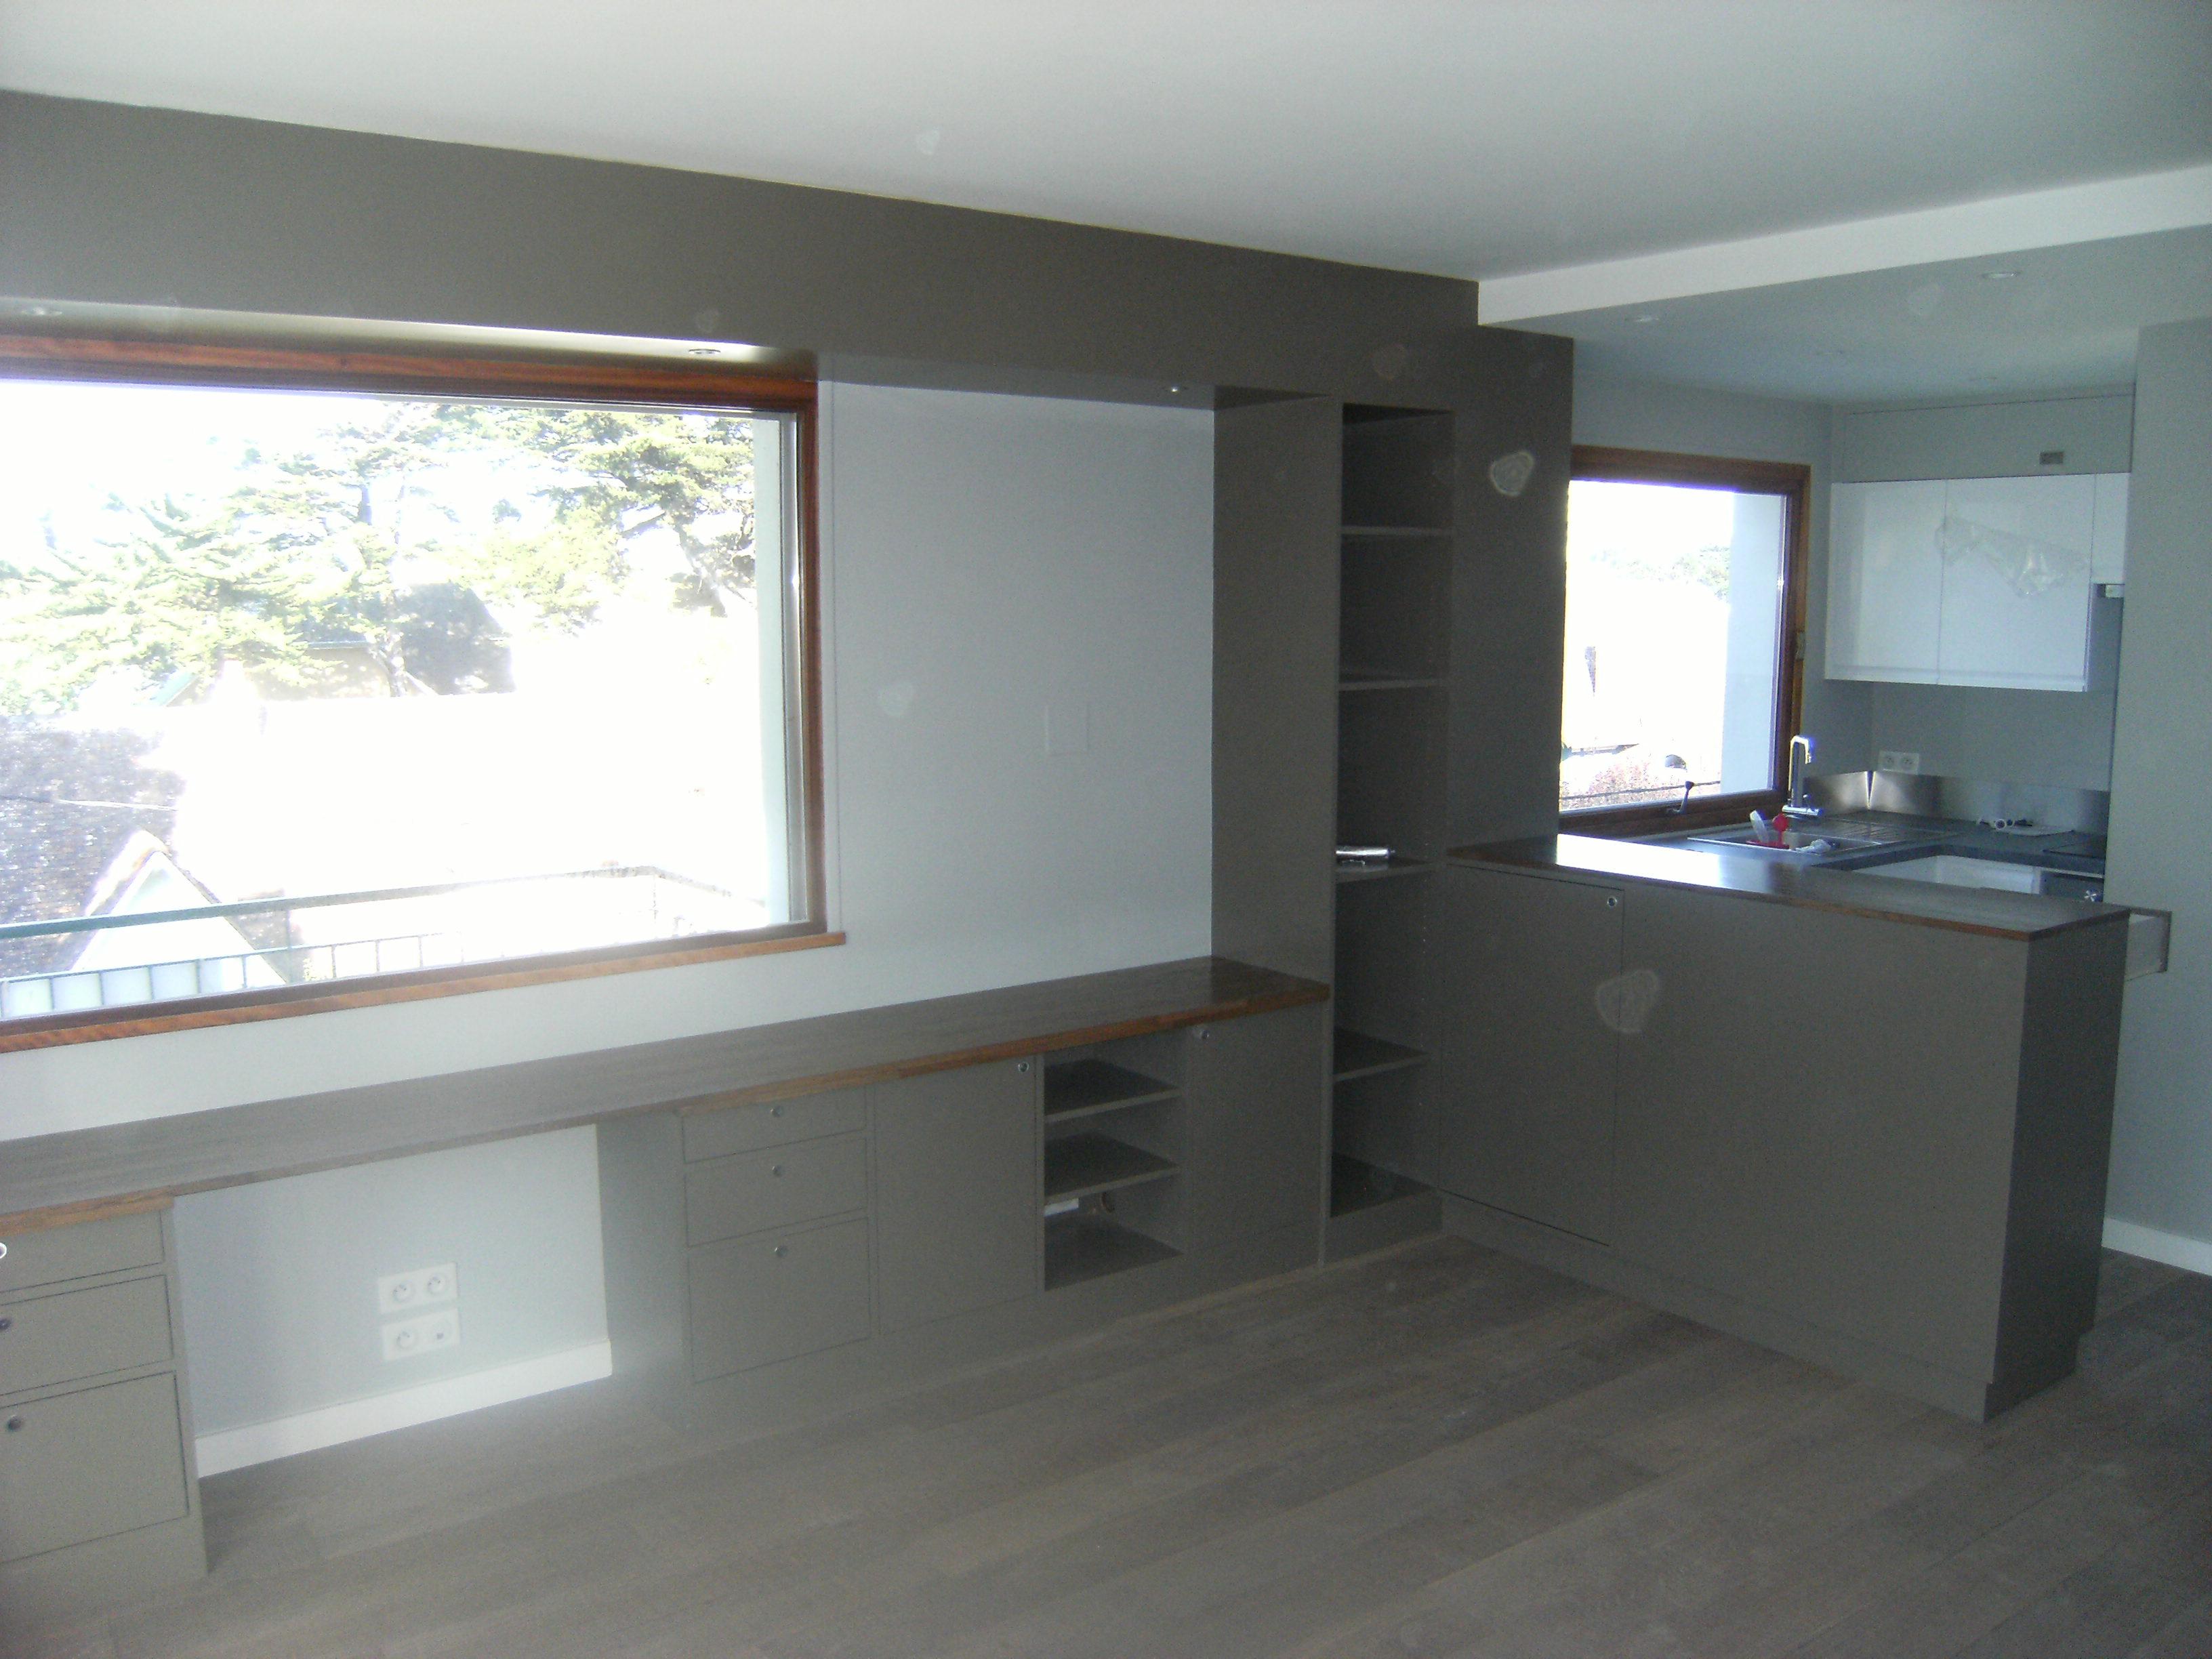 fabrication et pose jetouchedubois. Black Bedroom Furniture Sets. Home Design Ideas